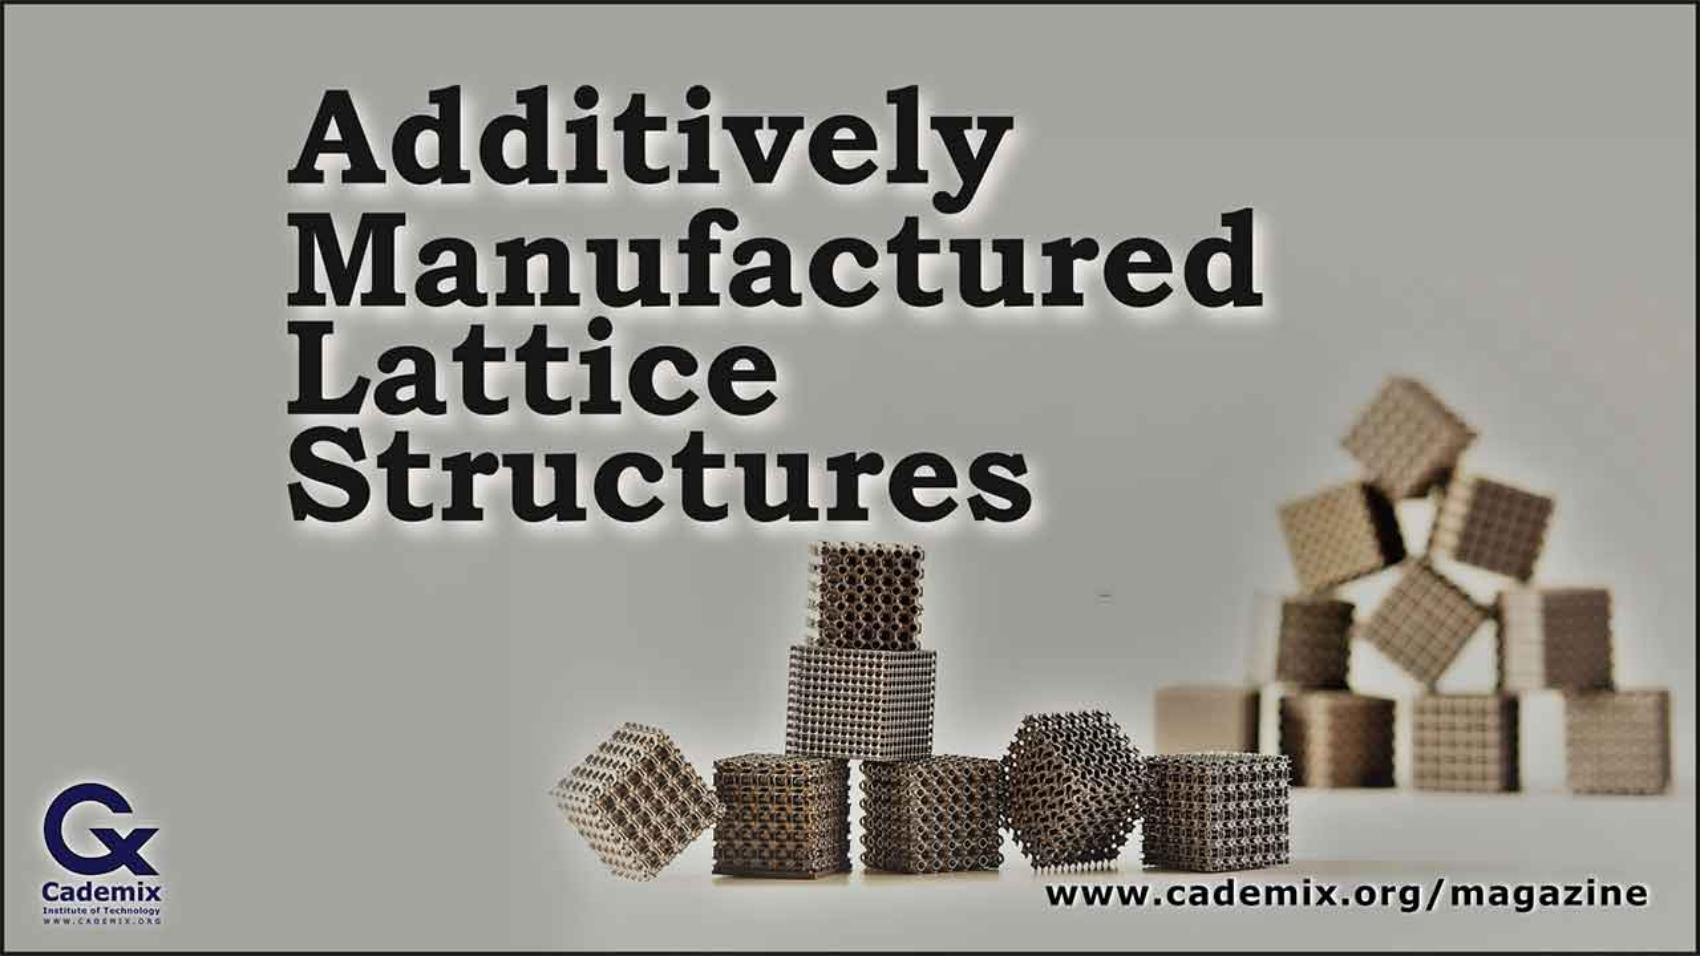 Additively Manufactured Lattice Structures Oraib Al-Ketan 3D Printed Cademix Magazine Article